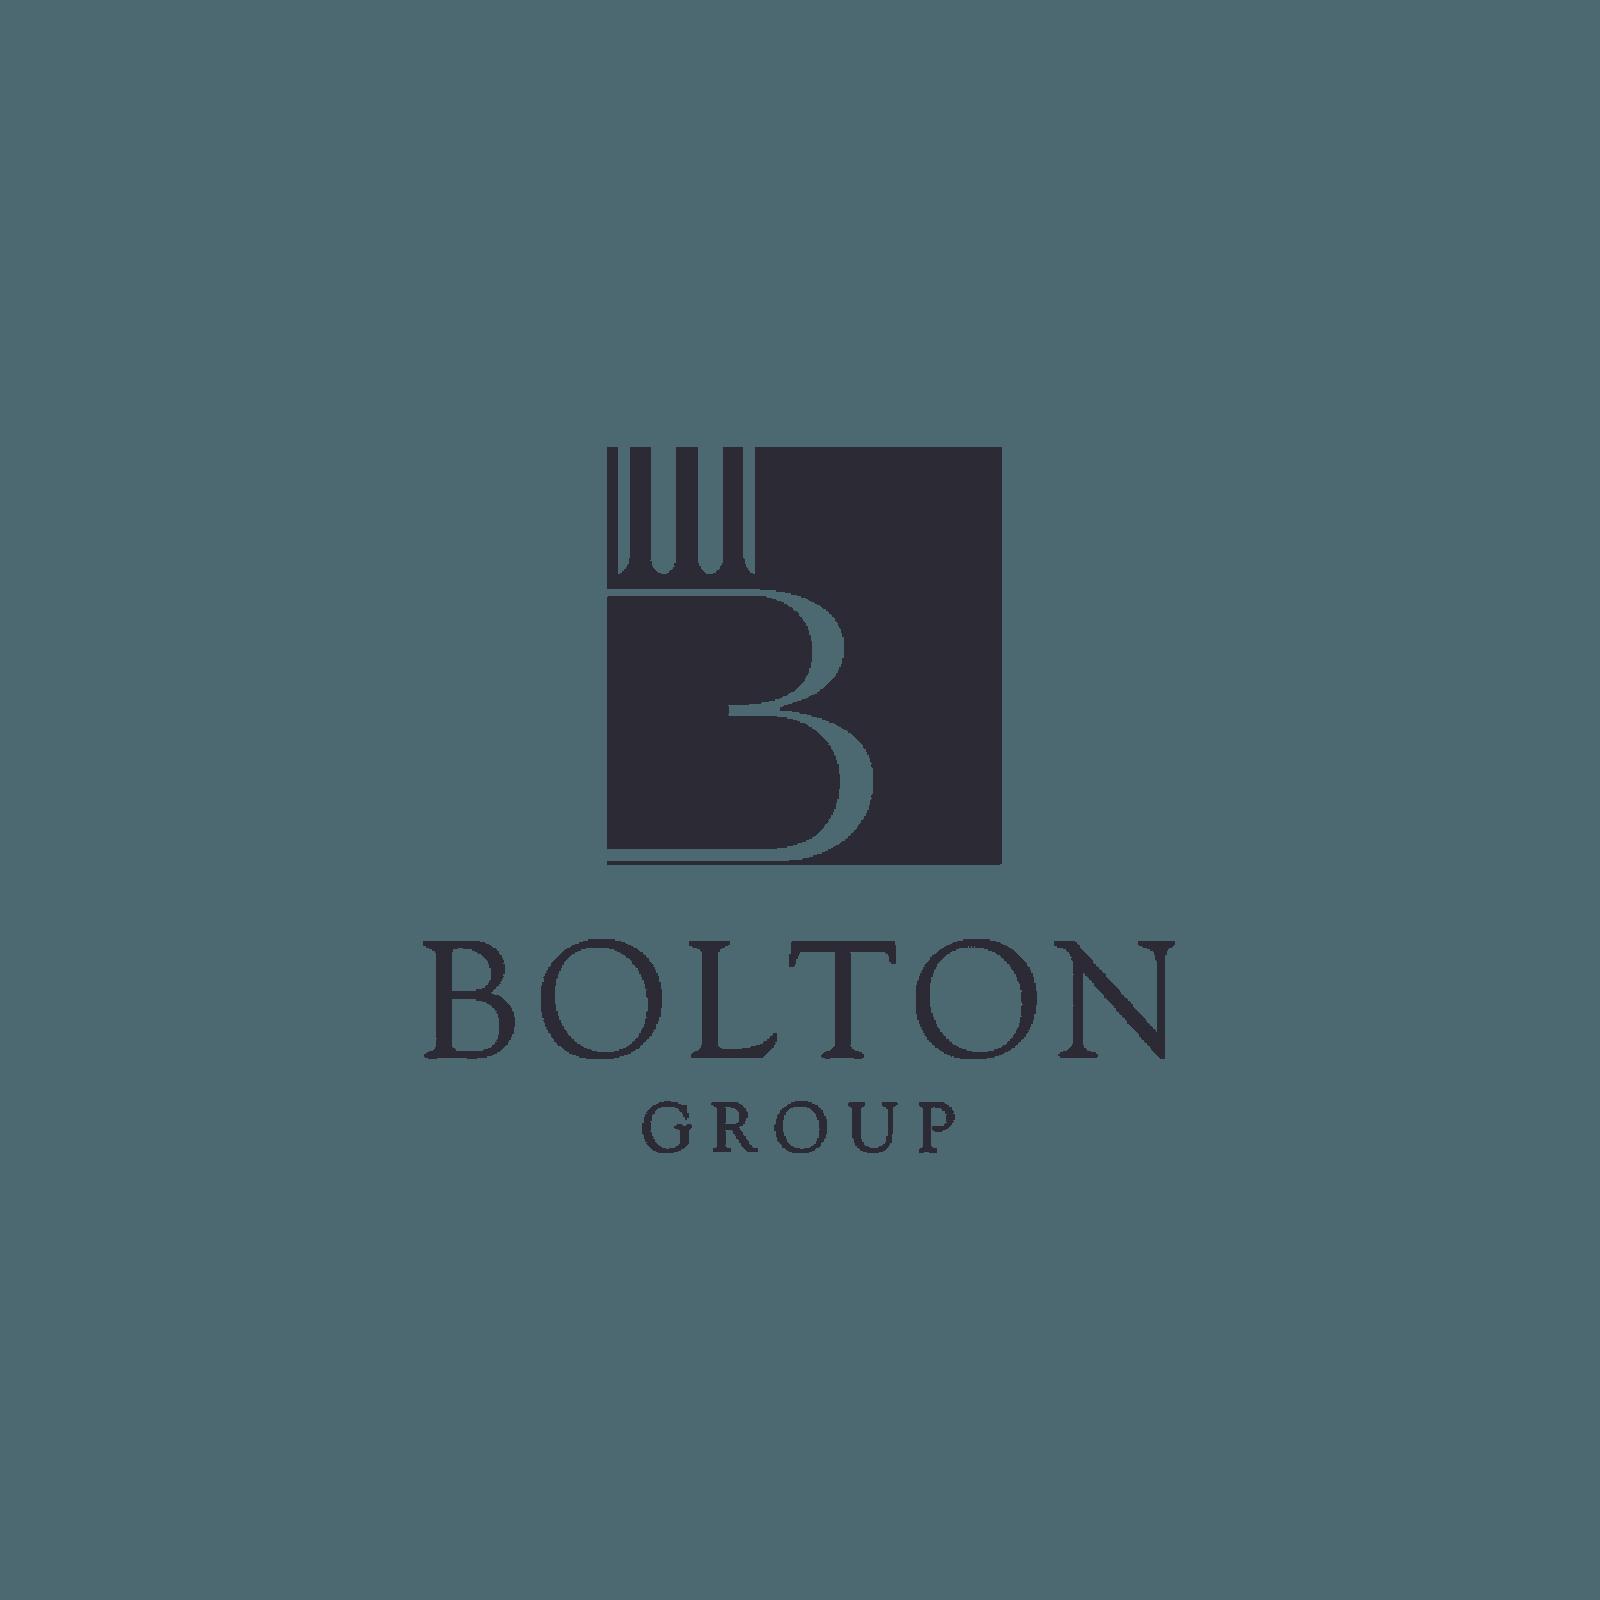 bolton group brand